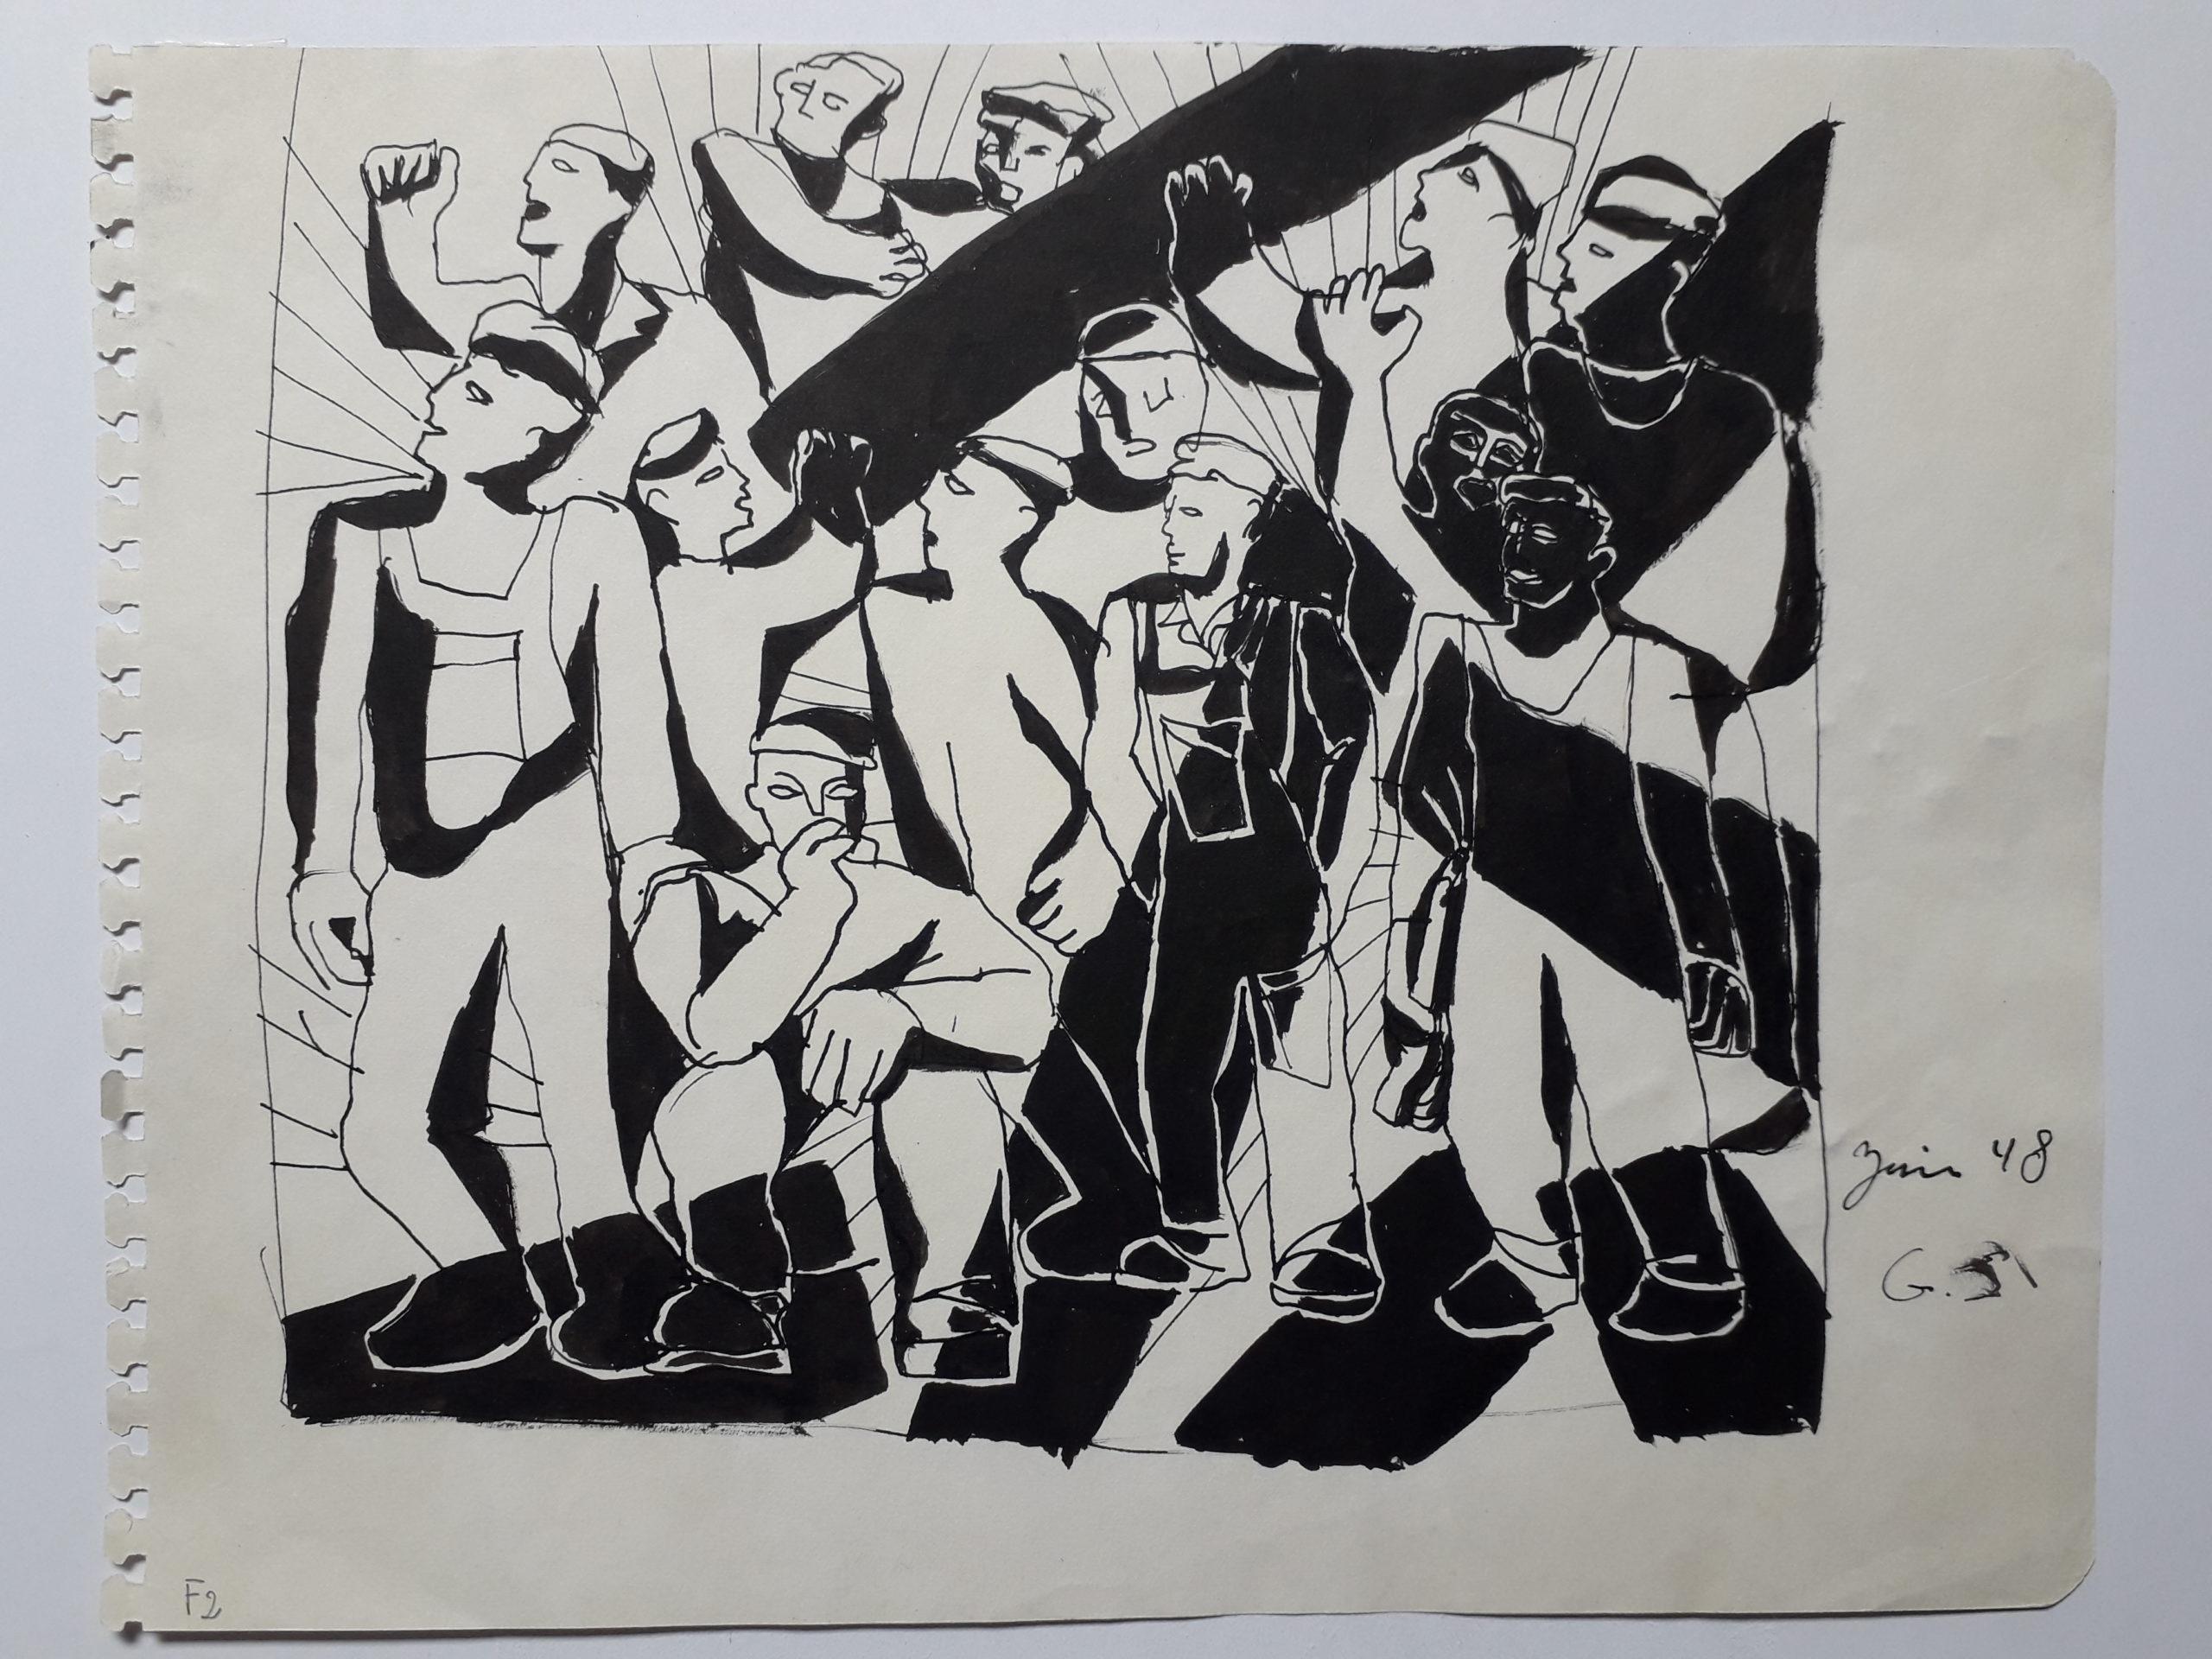 singer-gerard-contestation-F2